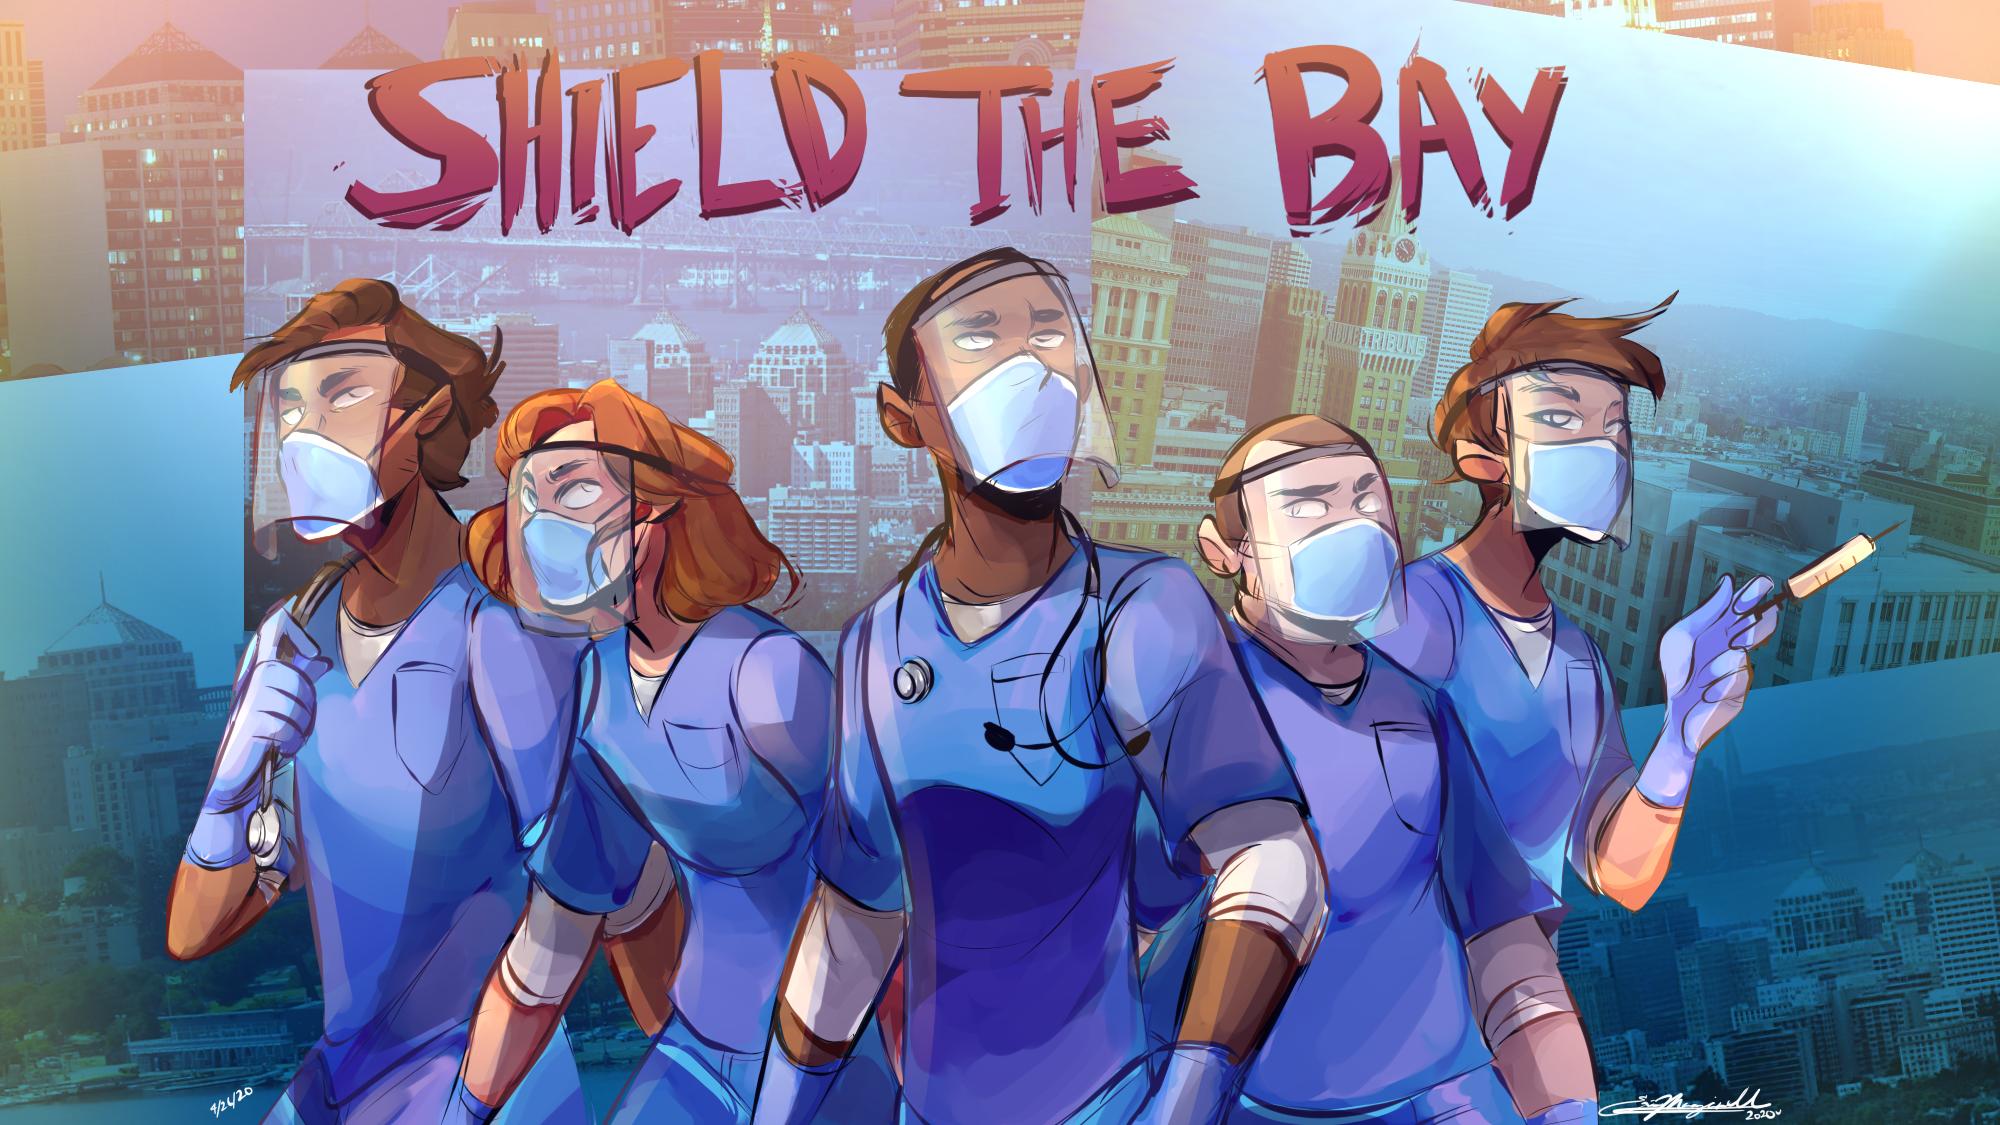 Shield the Bay